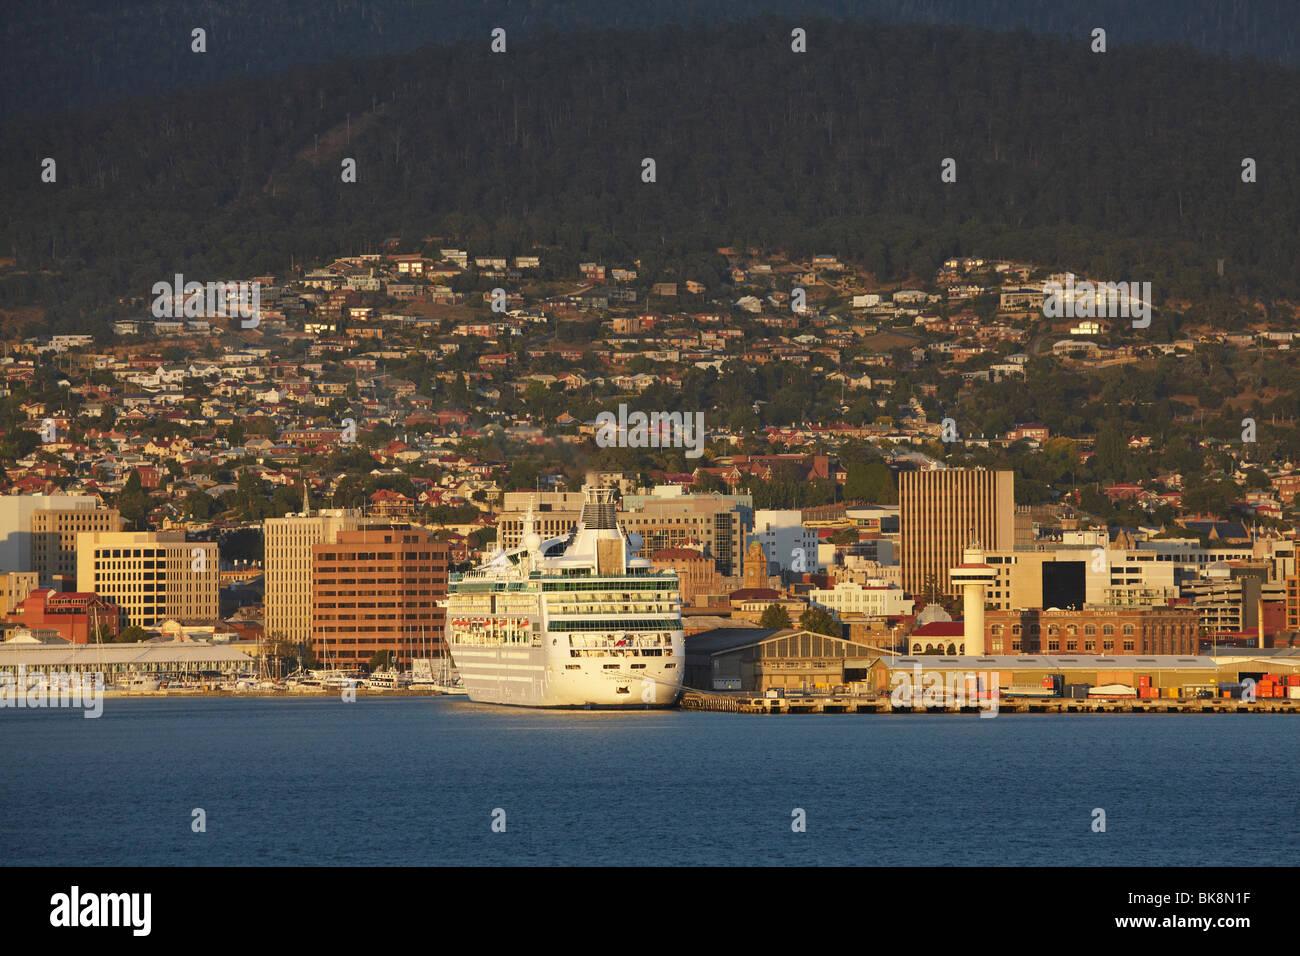 Rhapsody of the Seas Cruise Ship, Sullivans Cove, Hobart, Tasmania, Australia - Stock Image